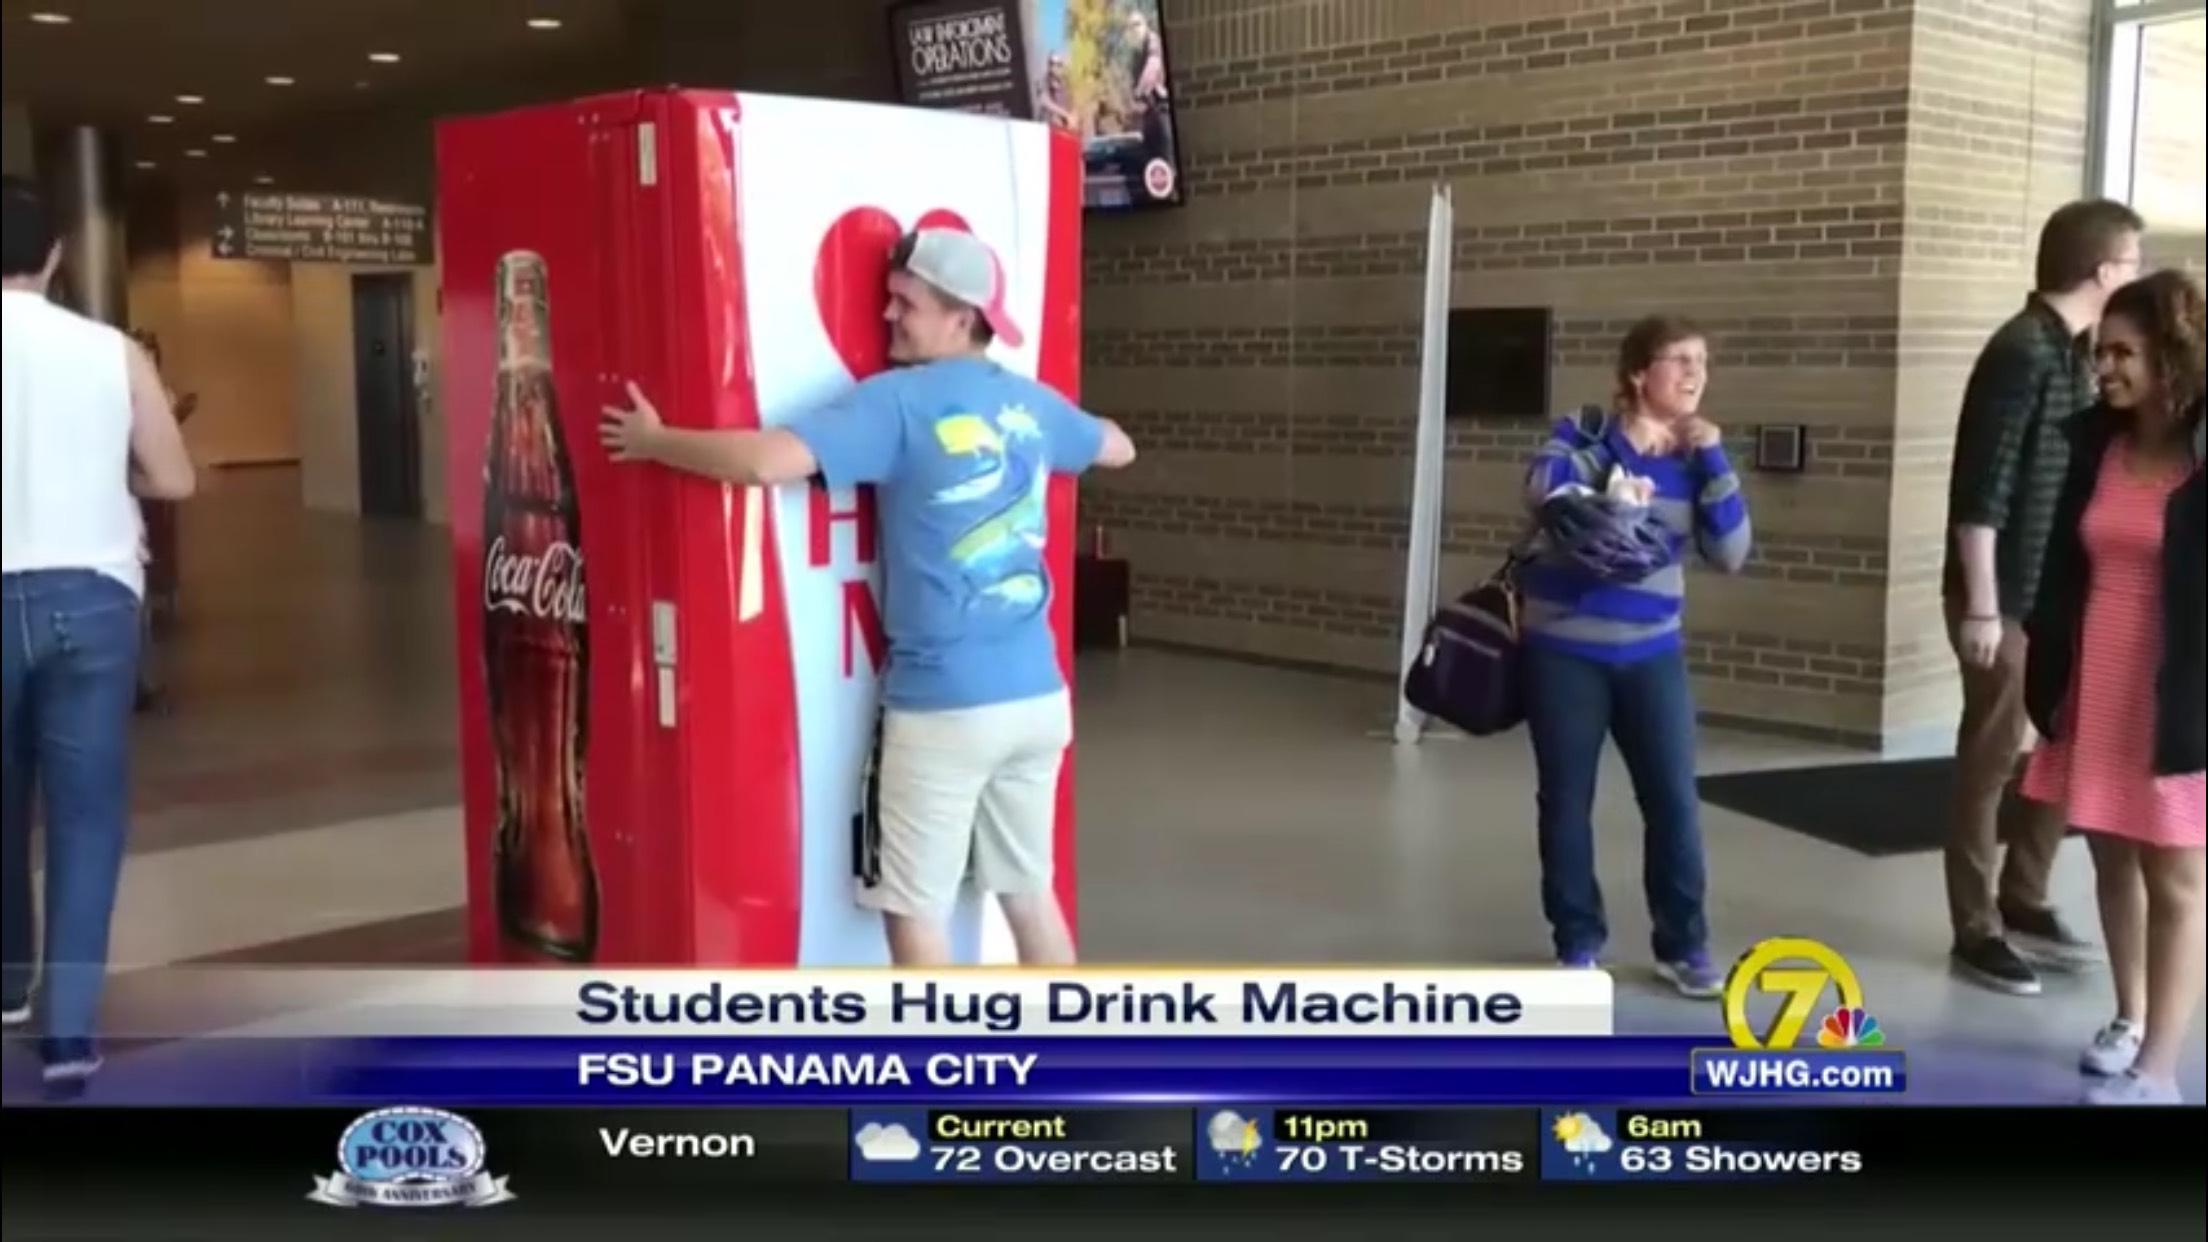 Students Hug Drink Machine